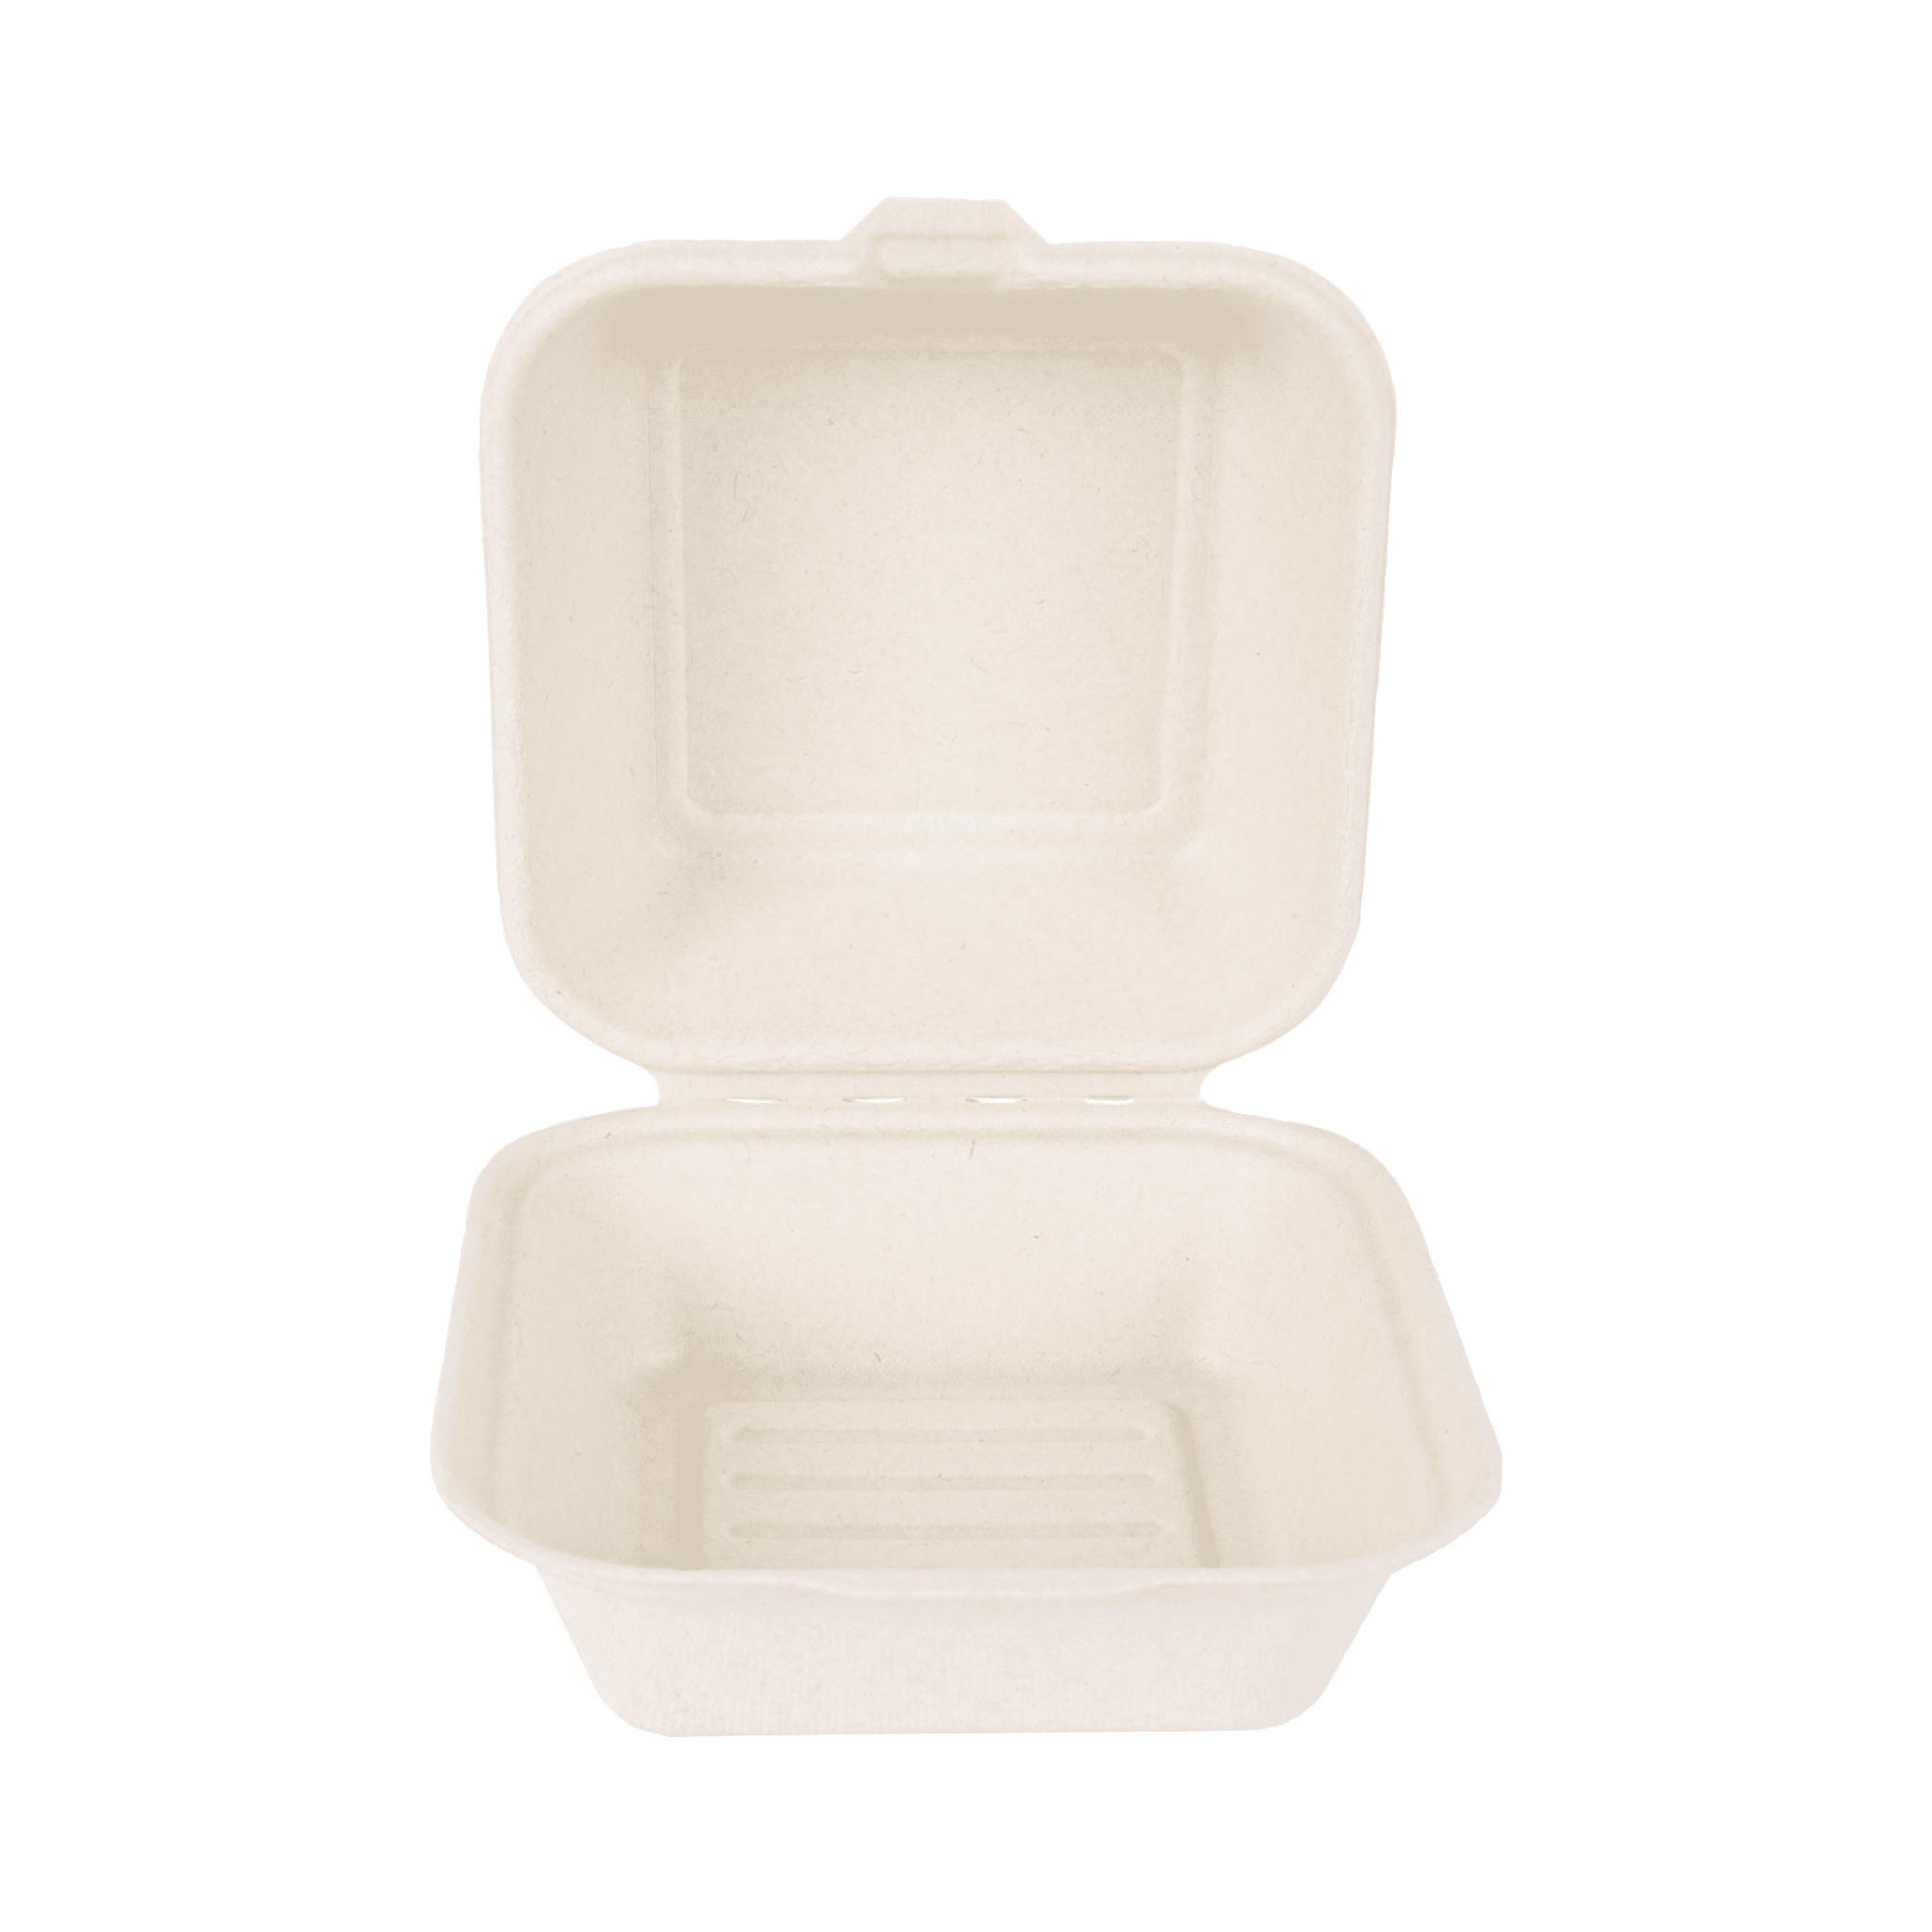 Biorazgradljiva posodica Hamburger | sladkorni trs | 15 x 15 x 8 cm | 50/1